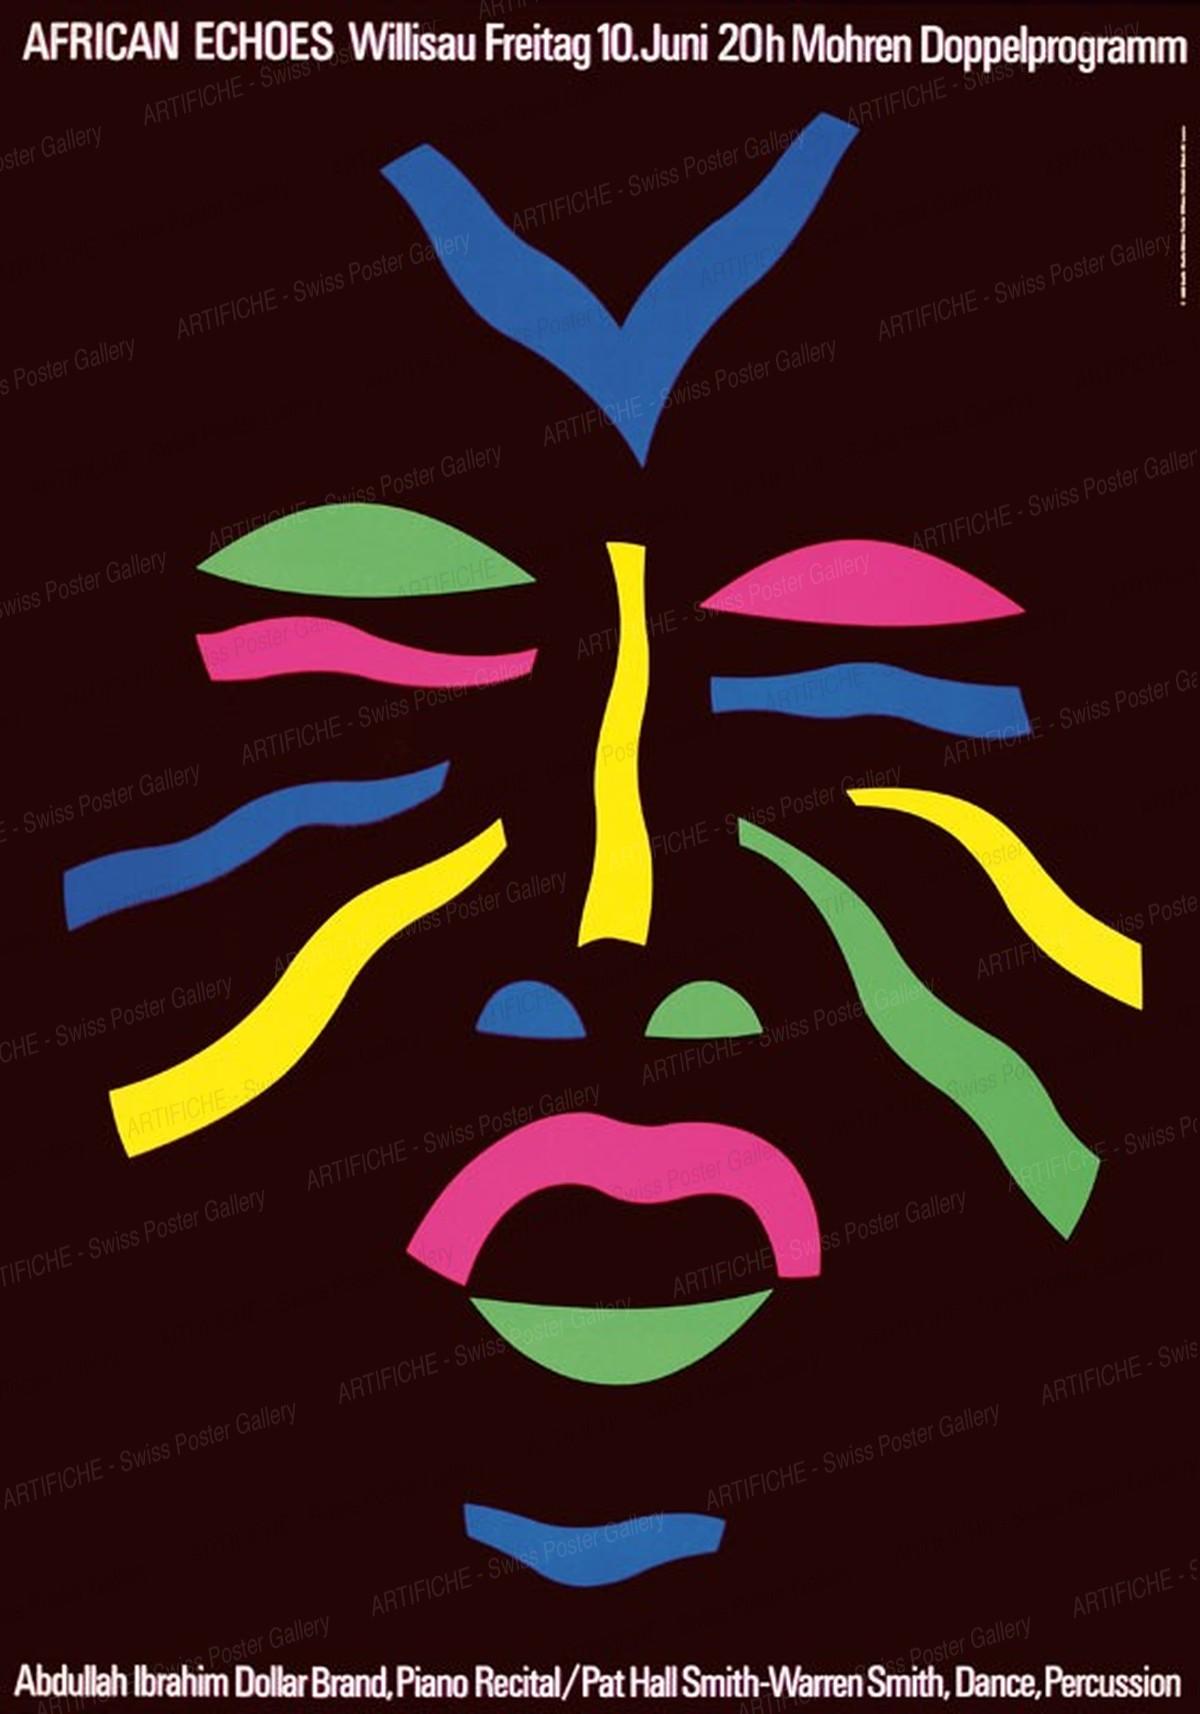 Jazz Willisau – African Echoes, Niklaus Troxler